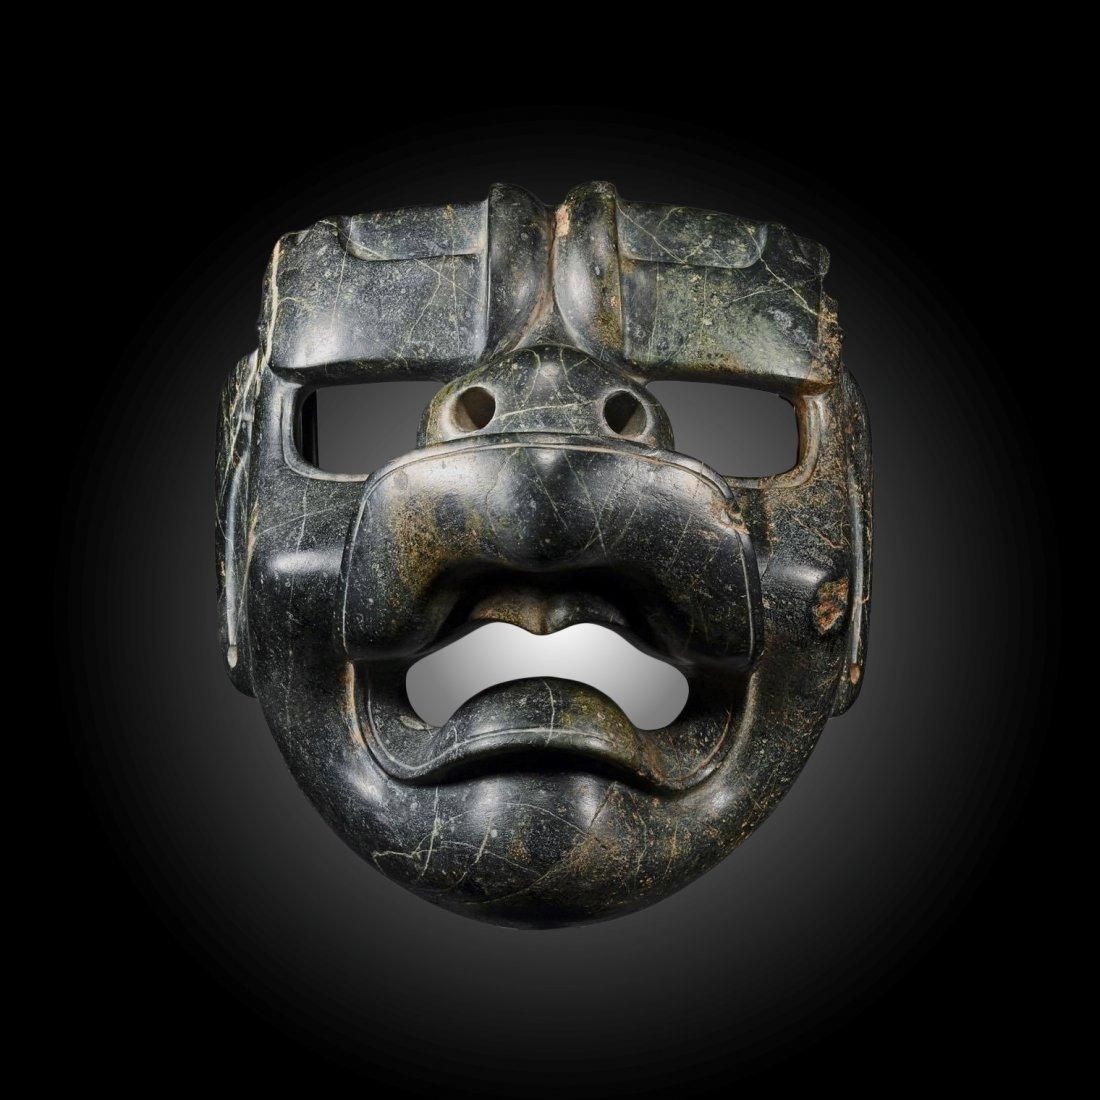 Important Authenticated Pre-Columbian Olmec Jaguar Mask